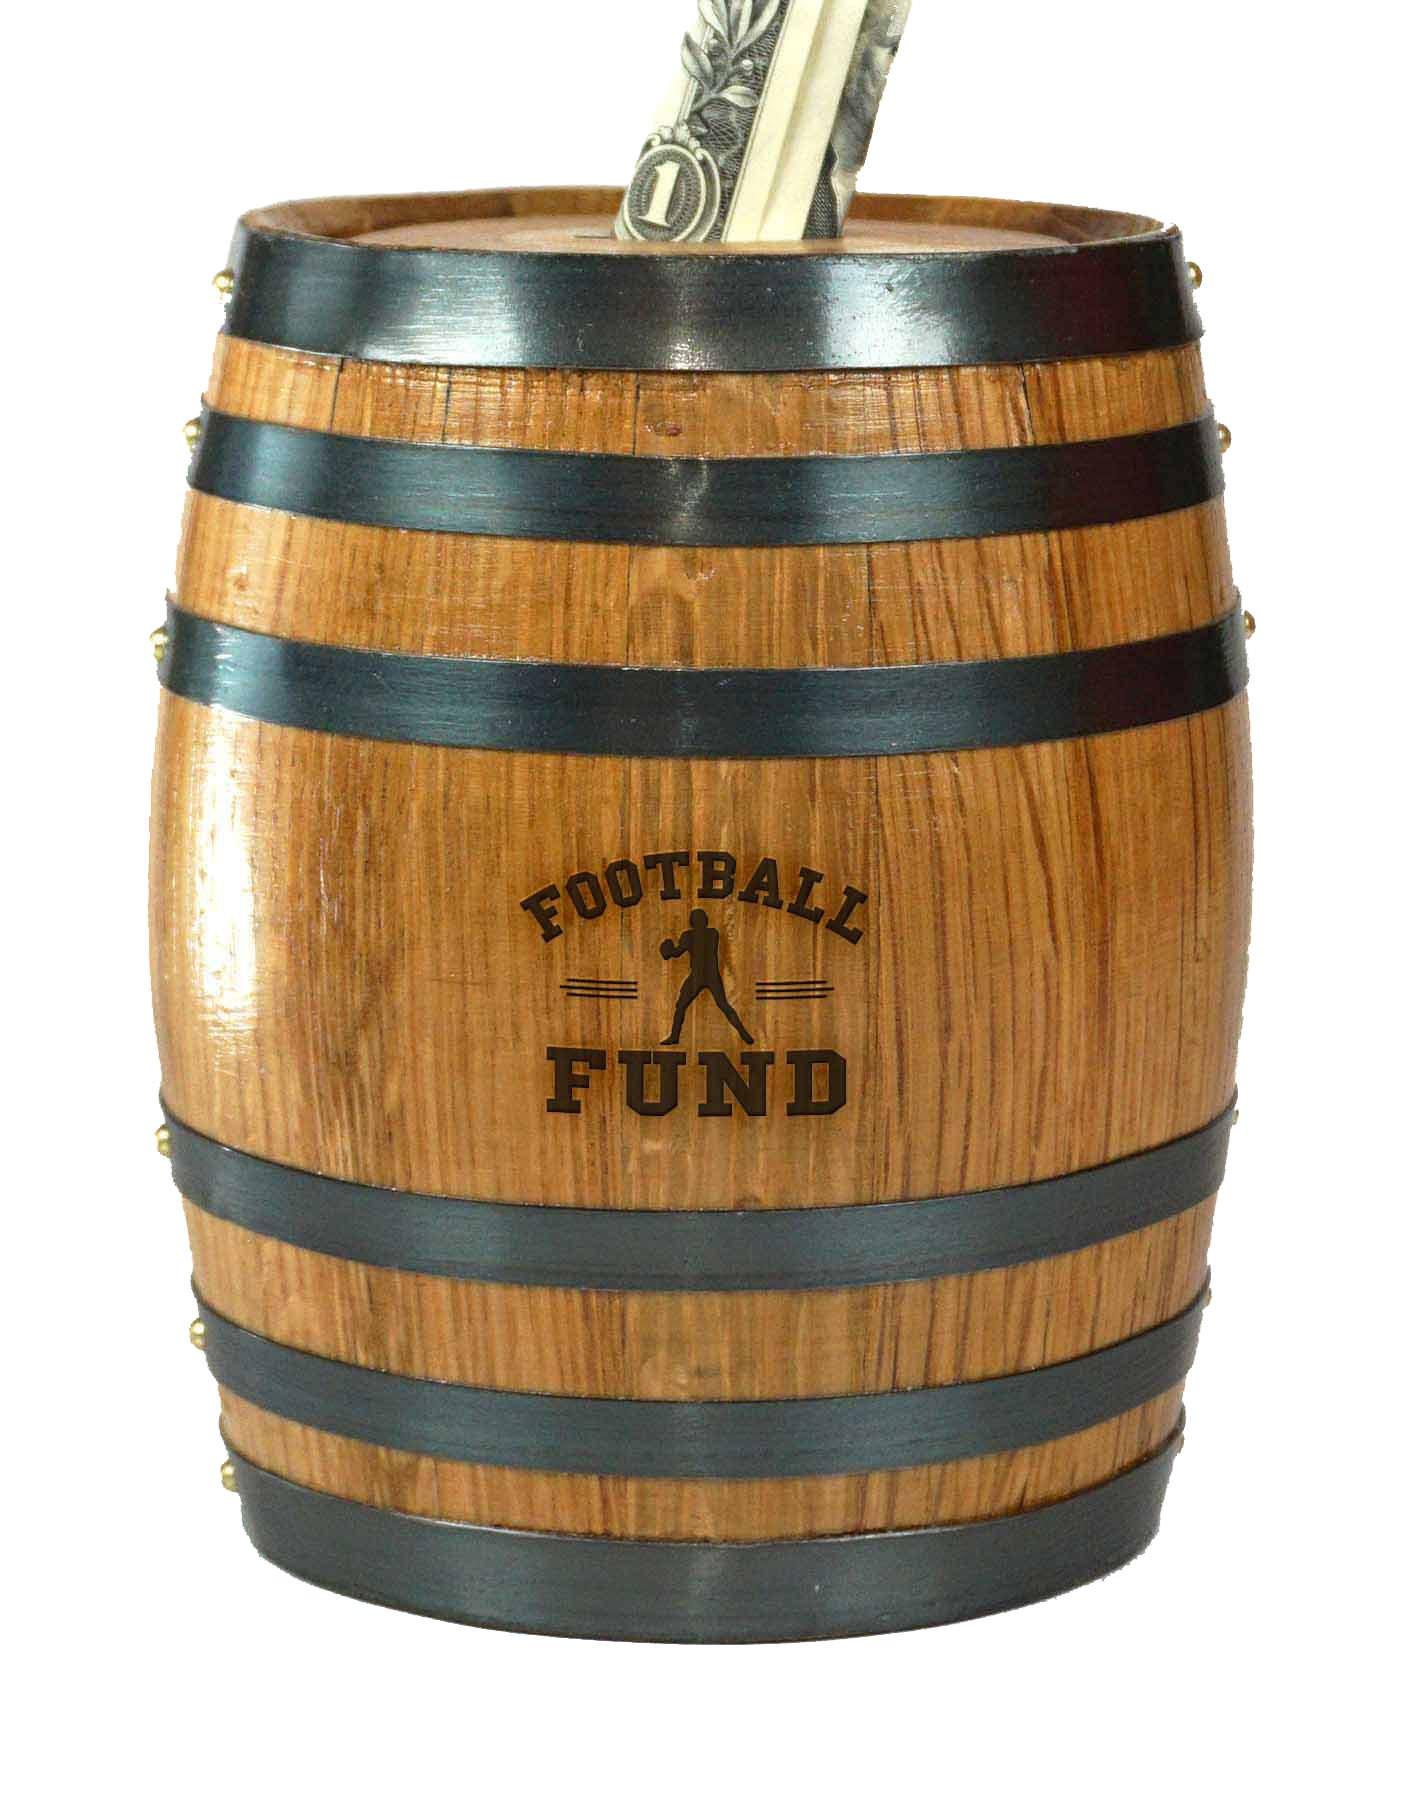 Mini Oak Barrel Piggy Bank Fund for Various Sports (Football Fund)